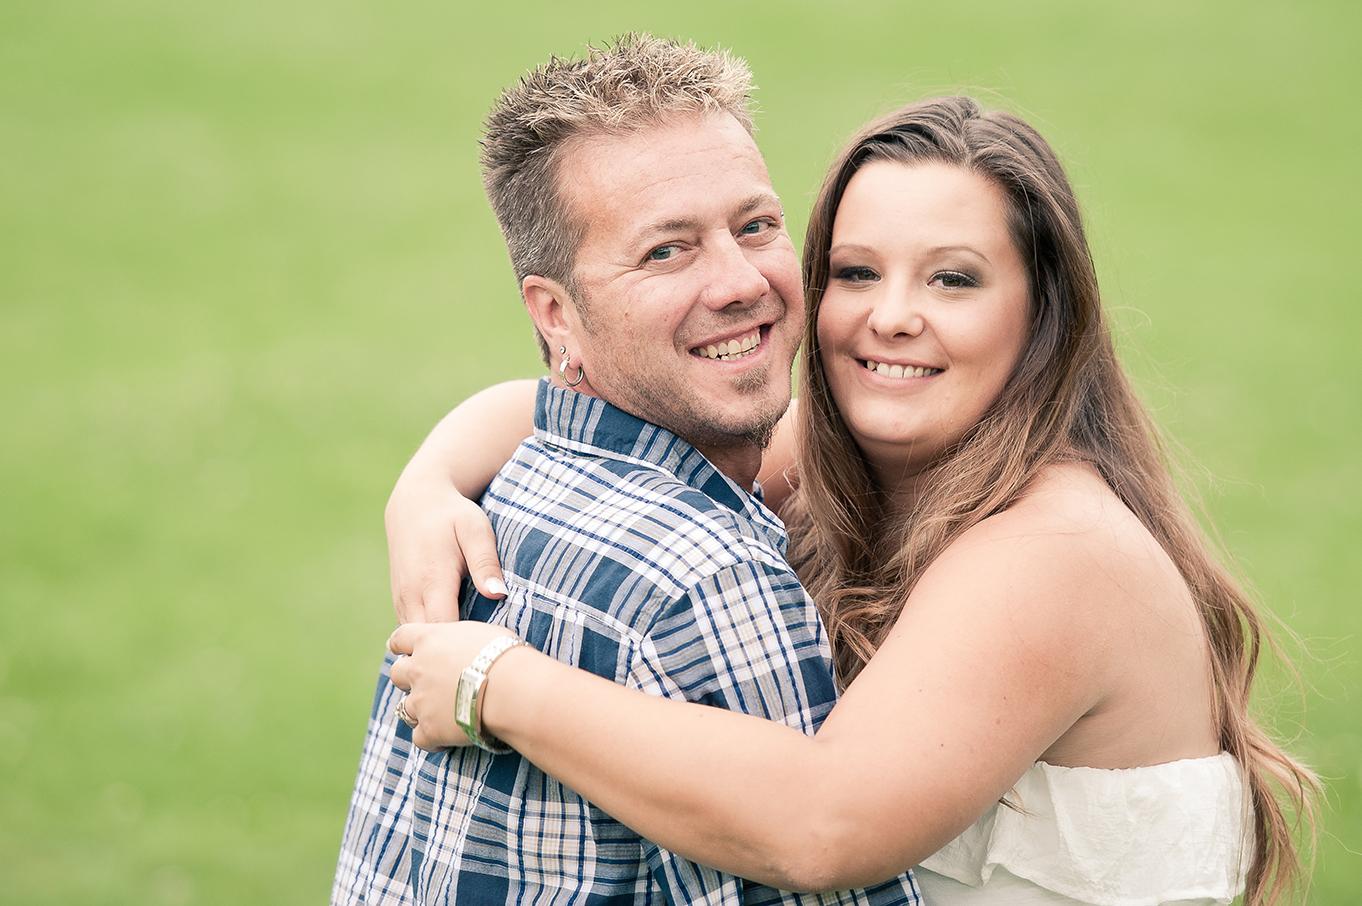 Amanda&Carlo_Engagement-162.jpg